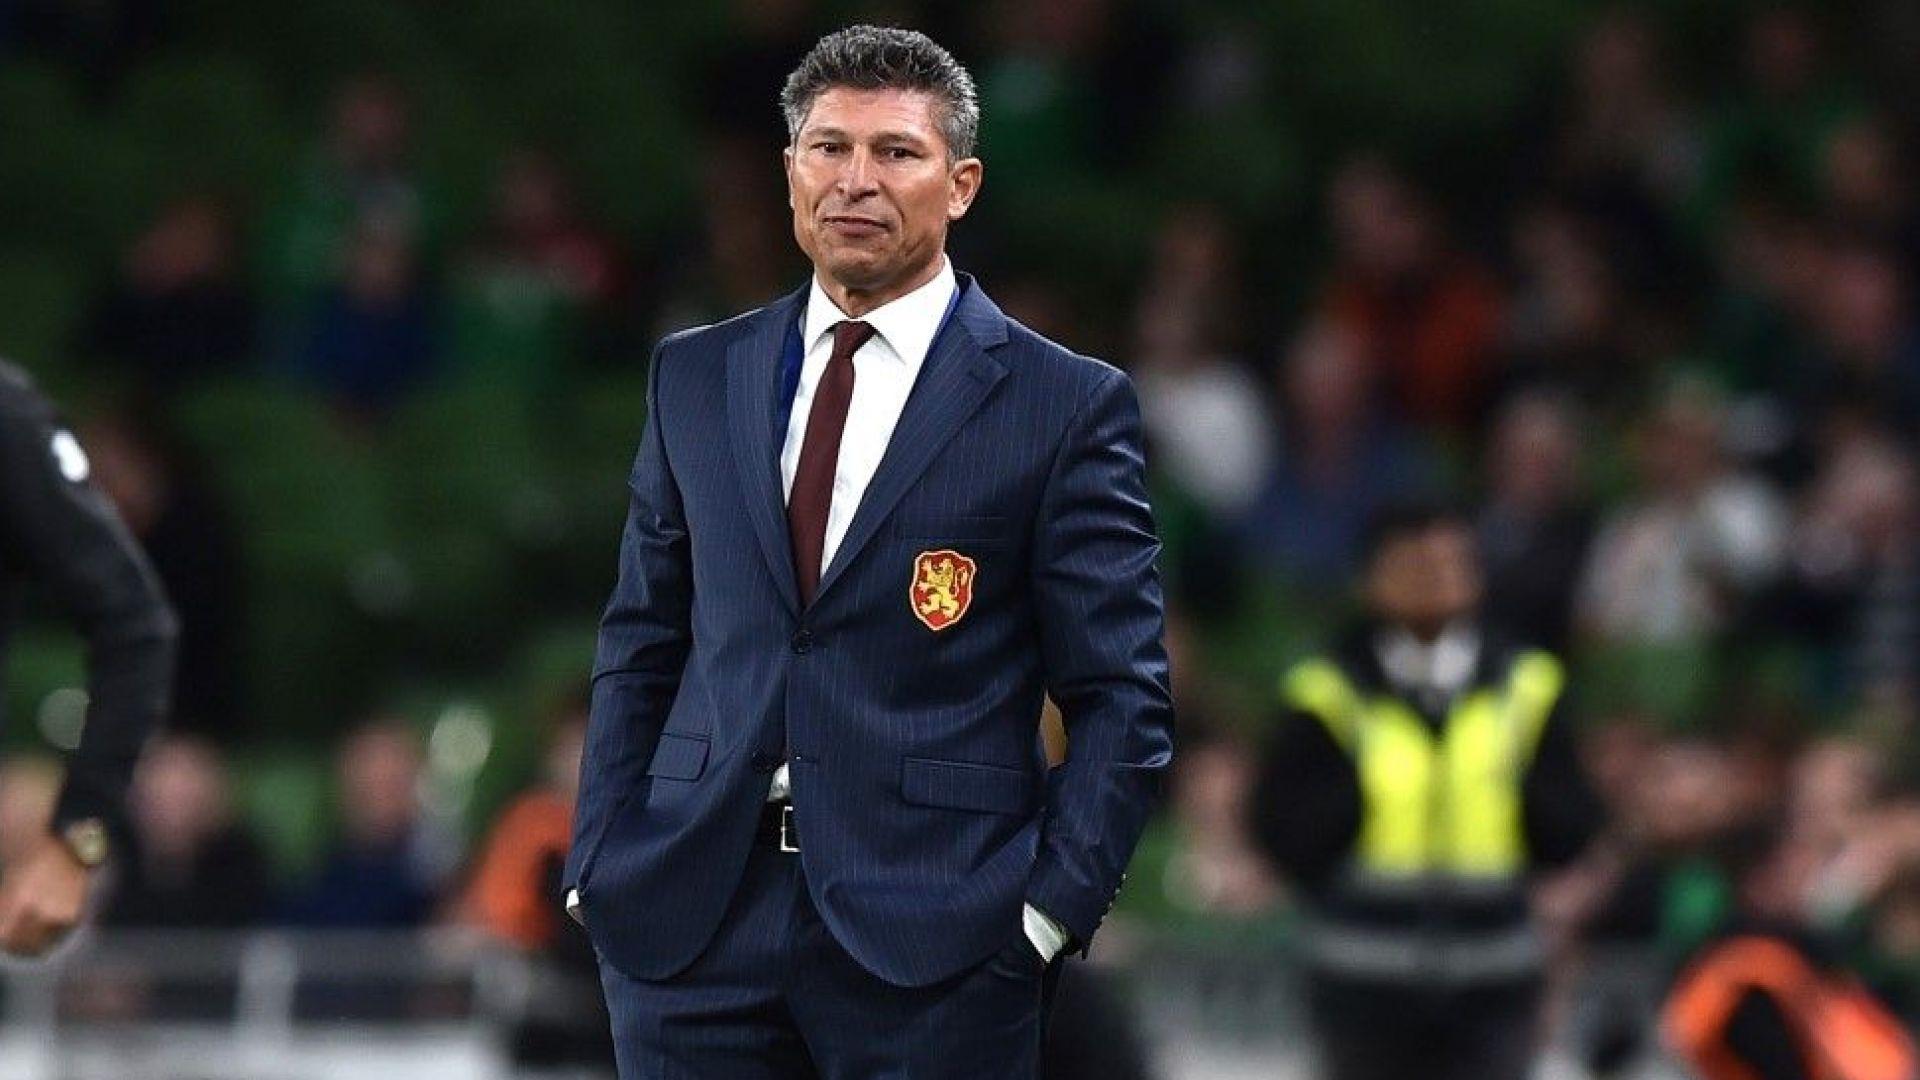 Красимир Балъков пое отговорност и напусна националния отбор